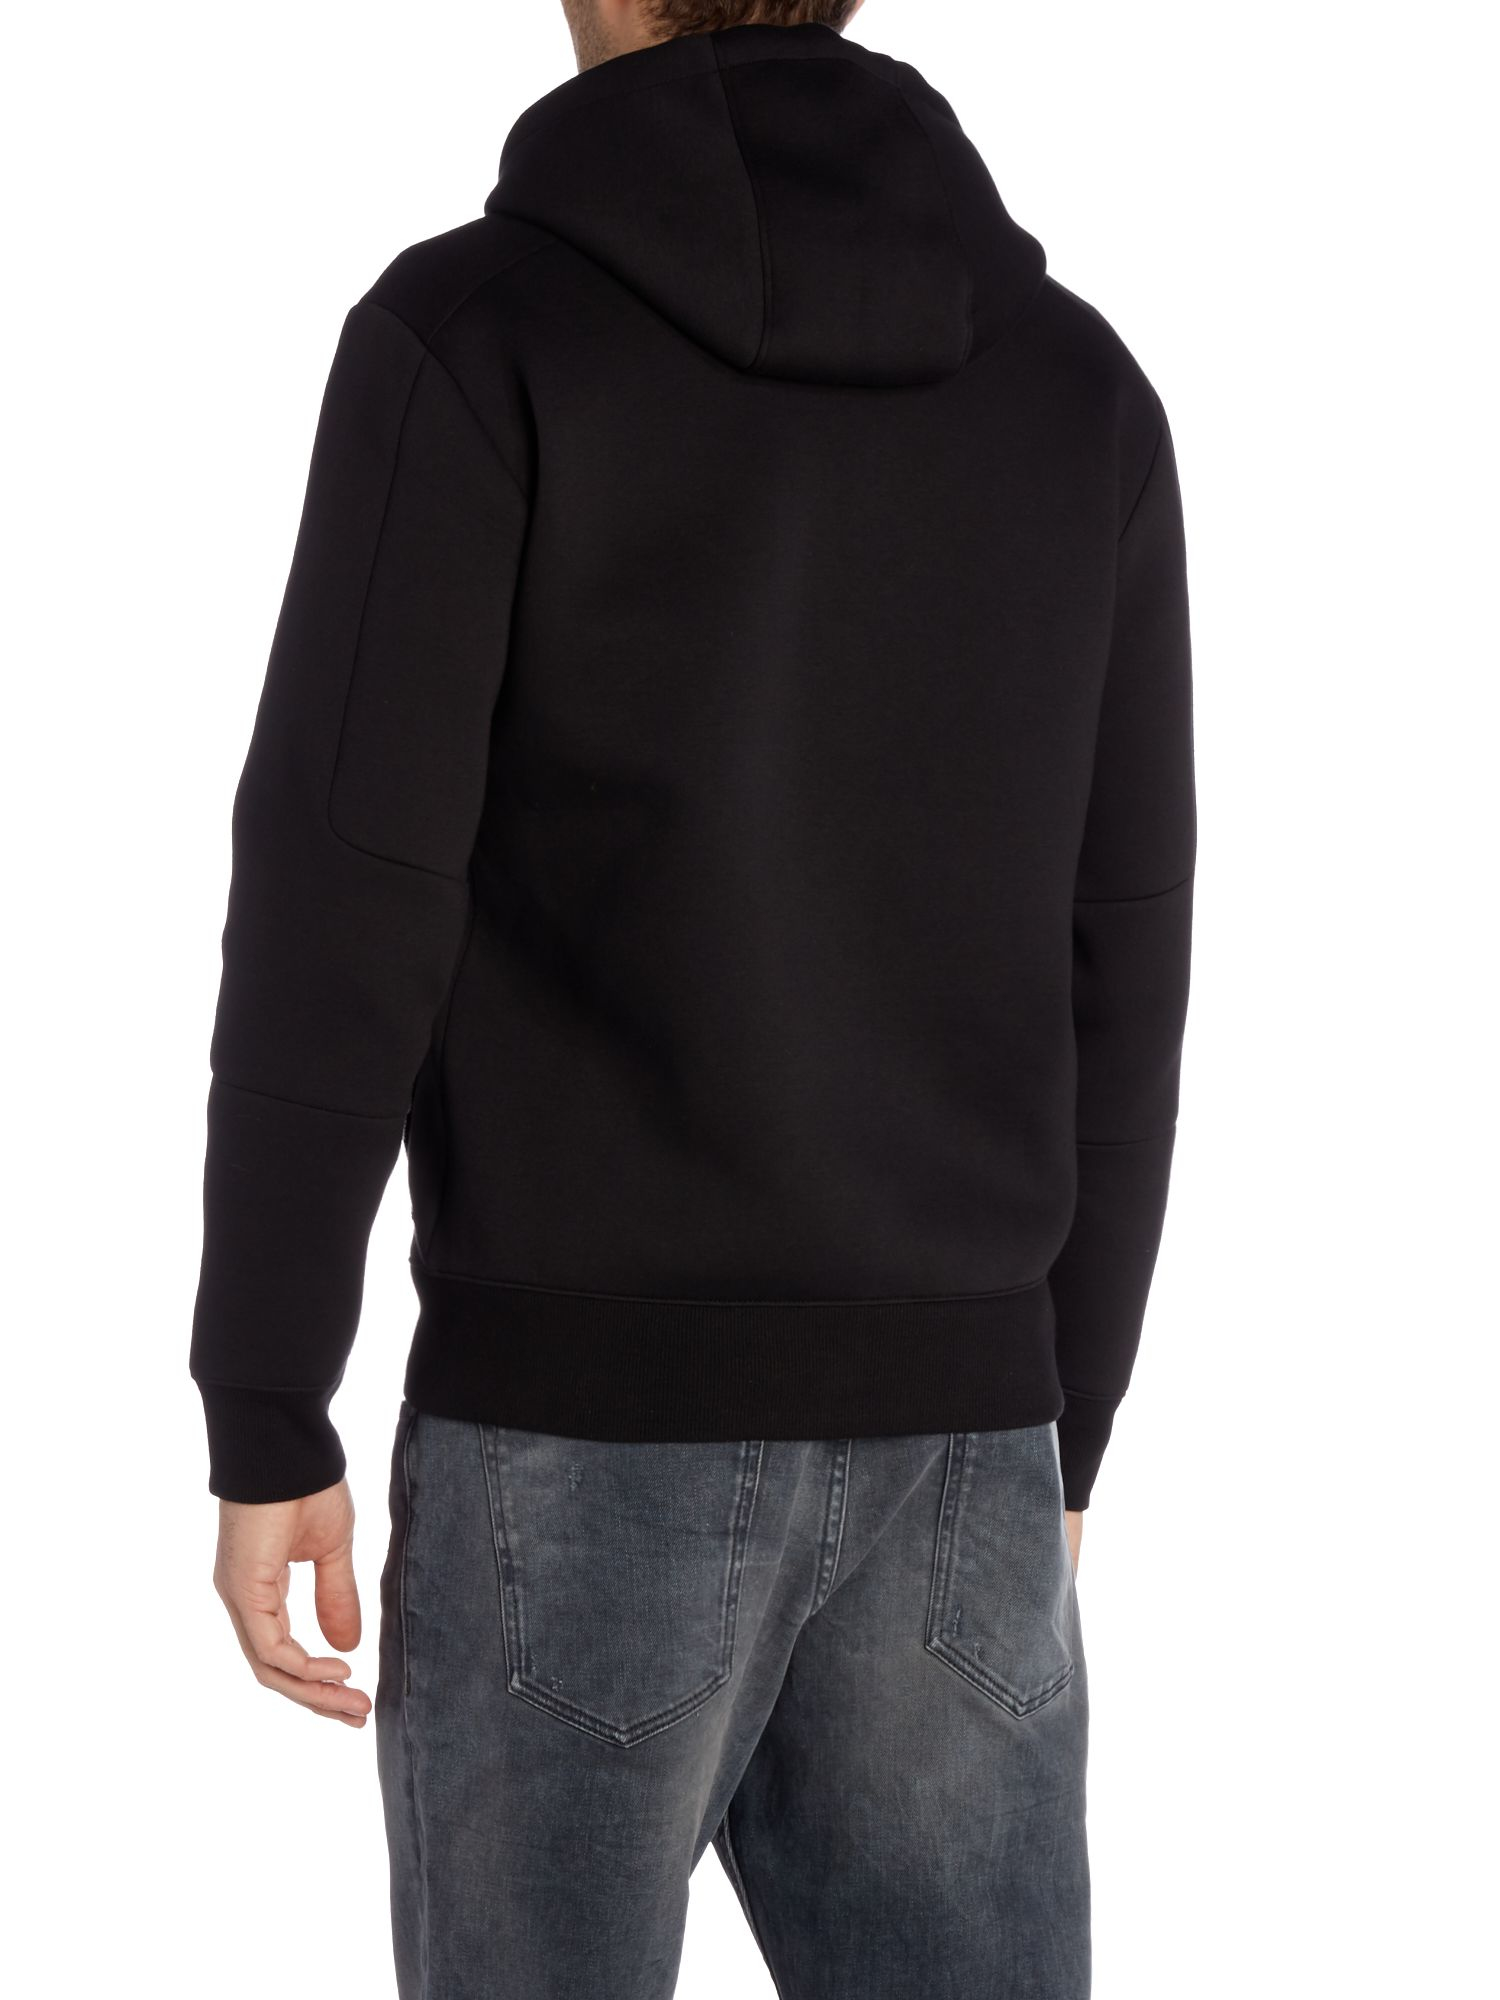 calvin klein jepson long sleeve zip through hoodie in black for men lyst. Black Bedroom Furniture Sets. Home Design Ideas